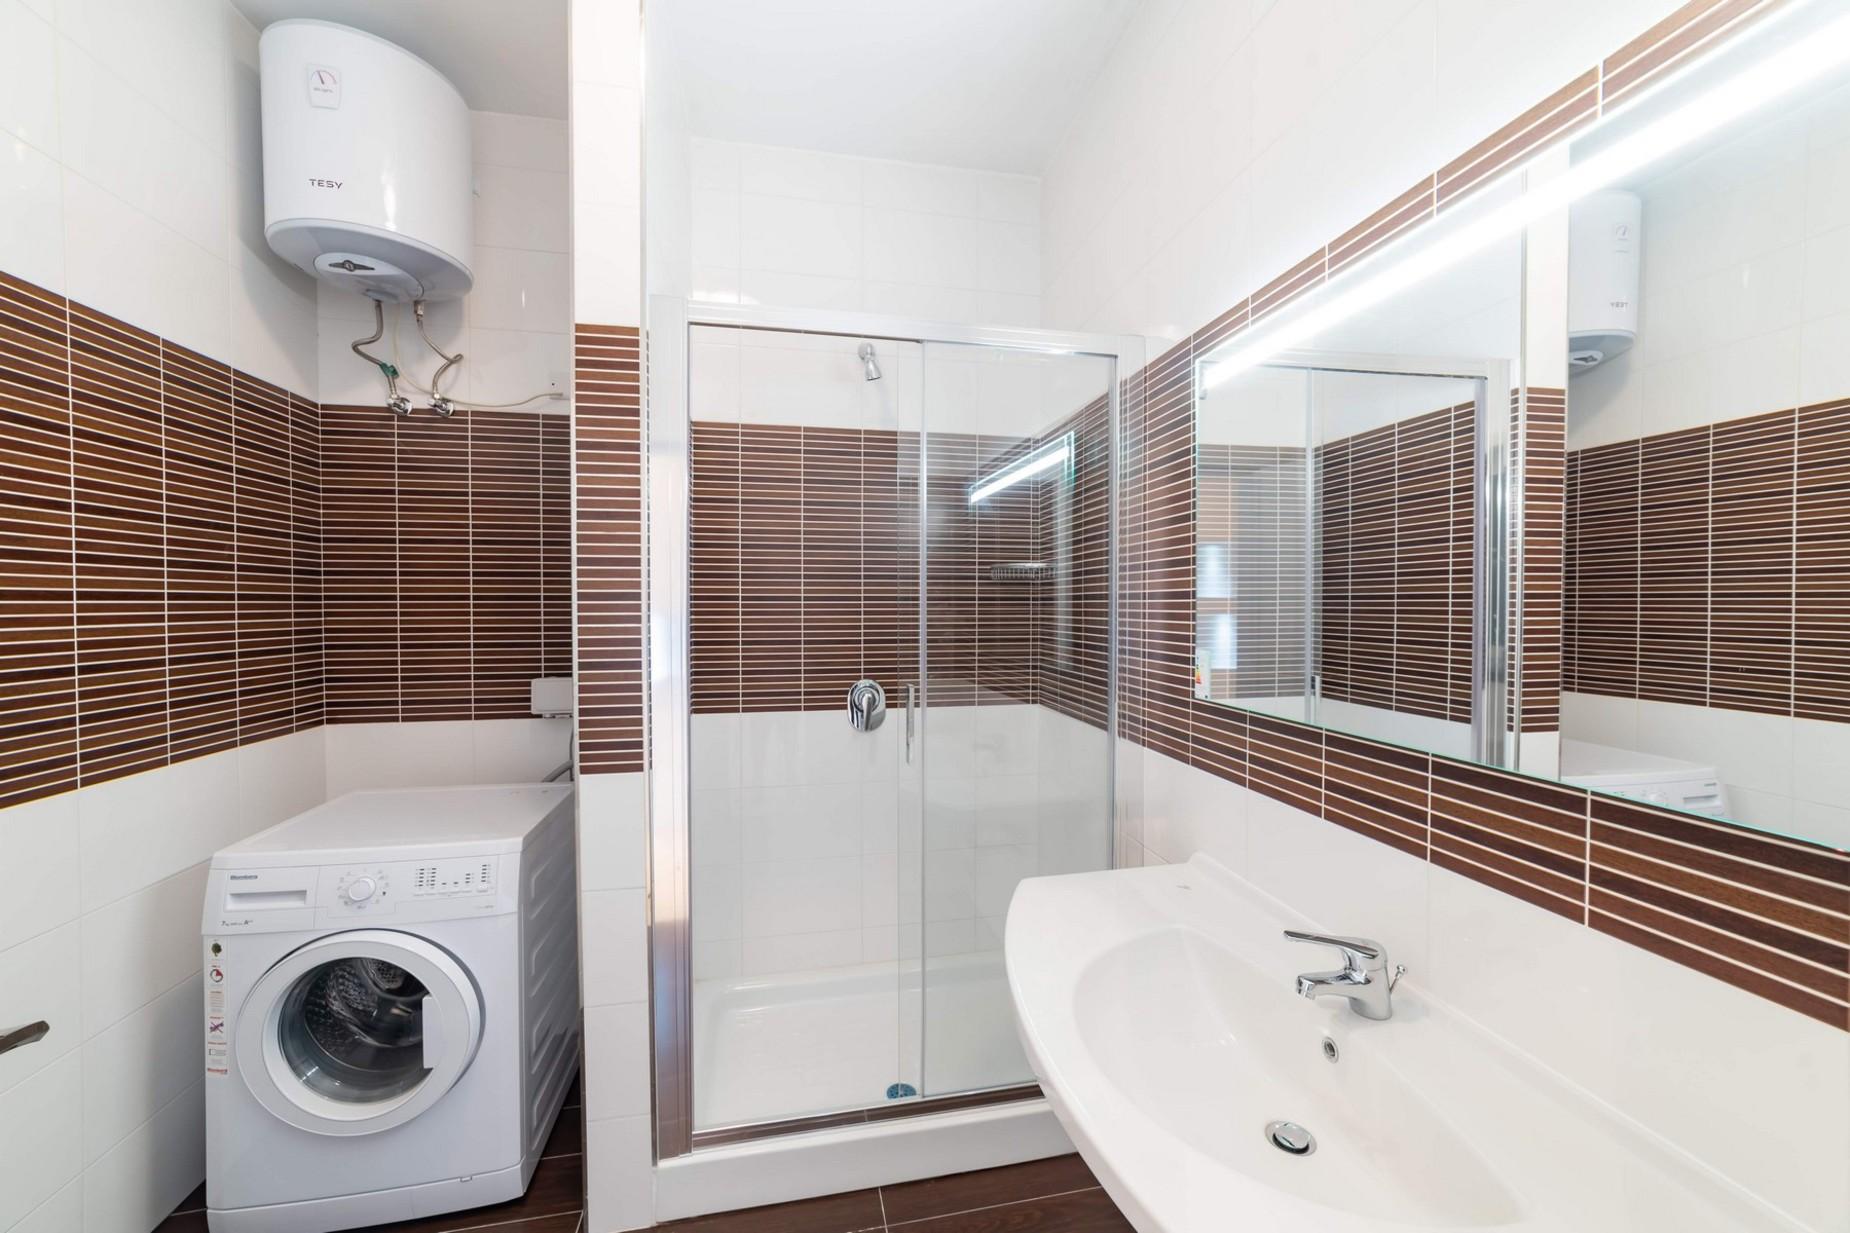 3 bed Apartment For Rent in Balzan, Balzan - thumb 12